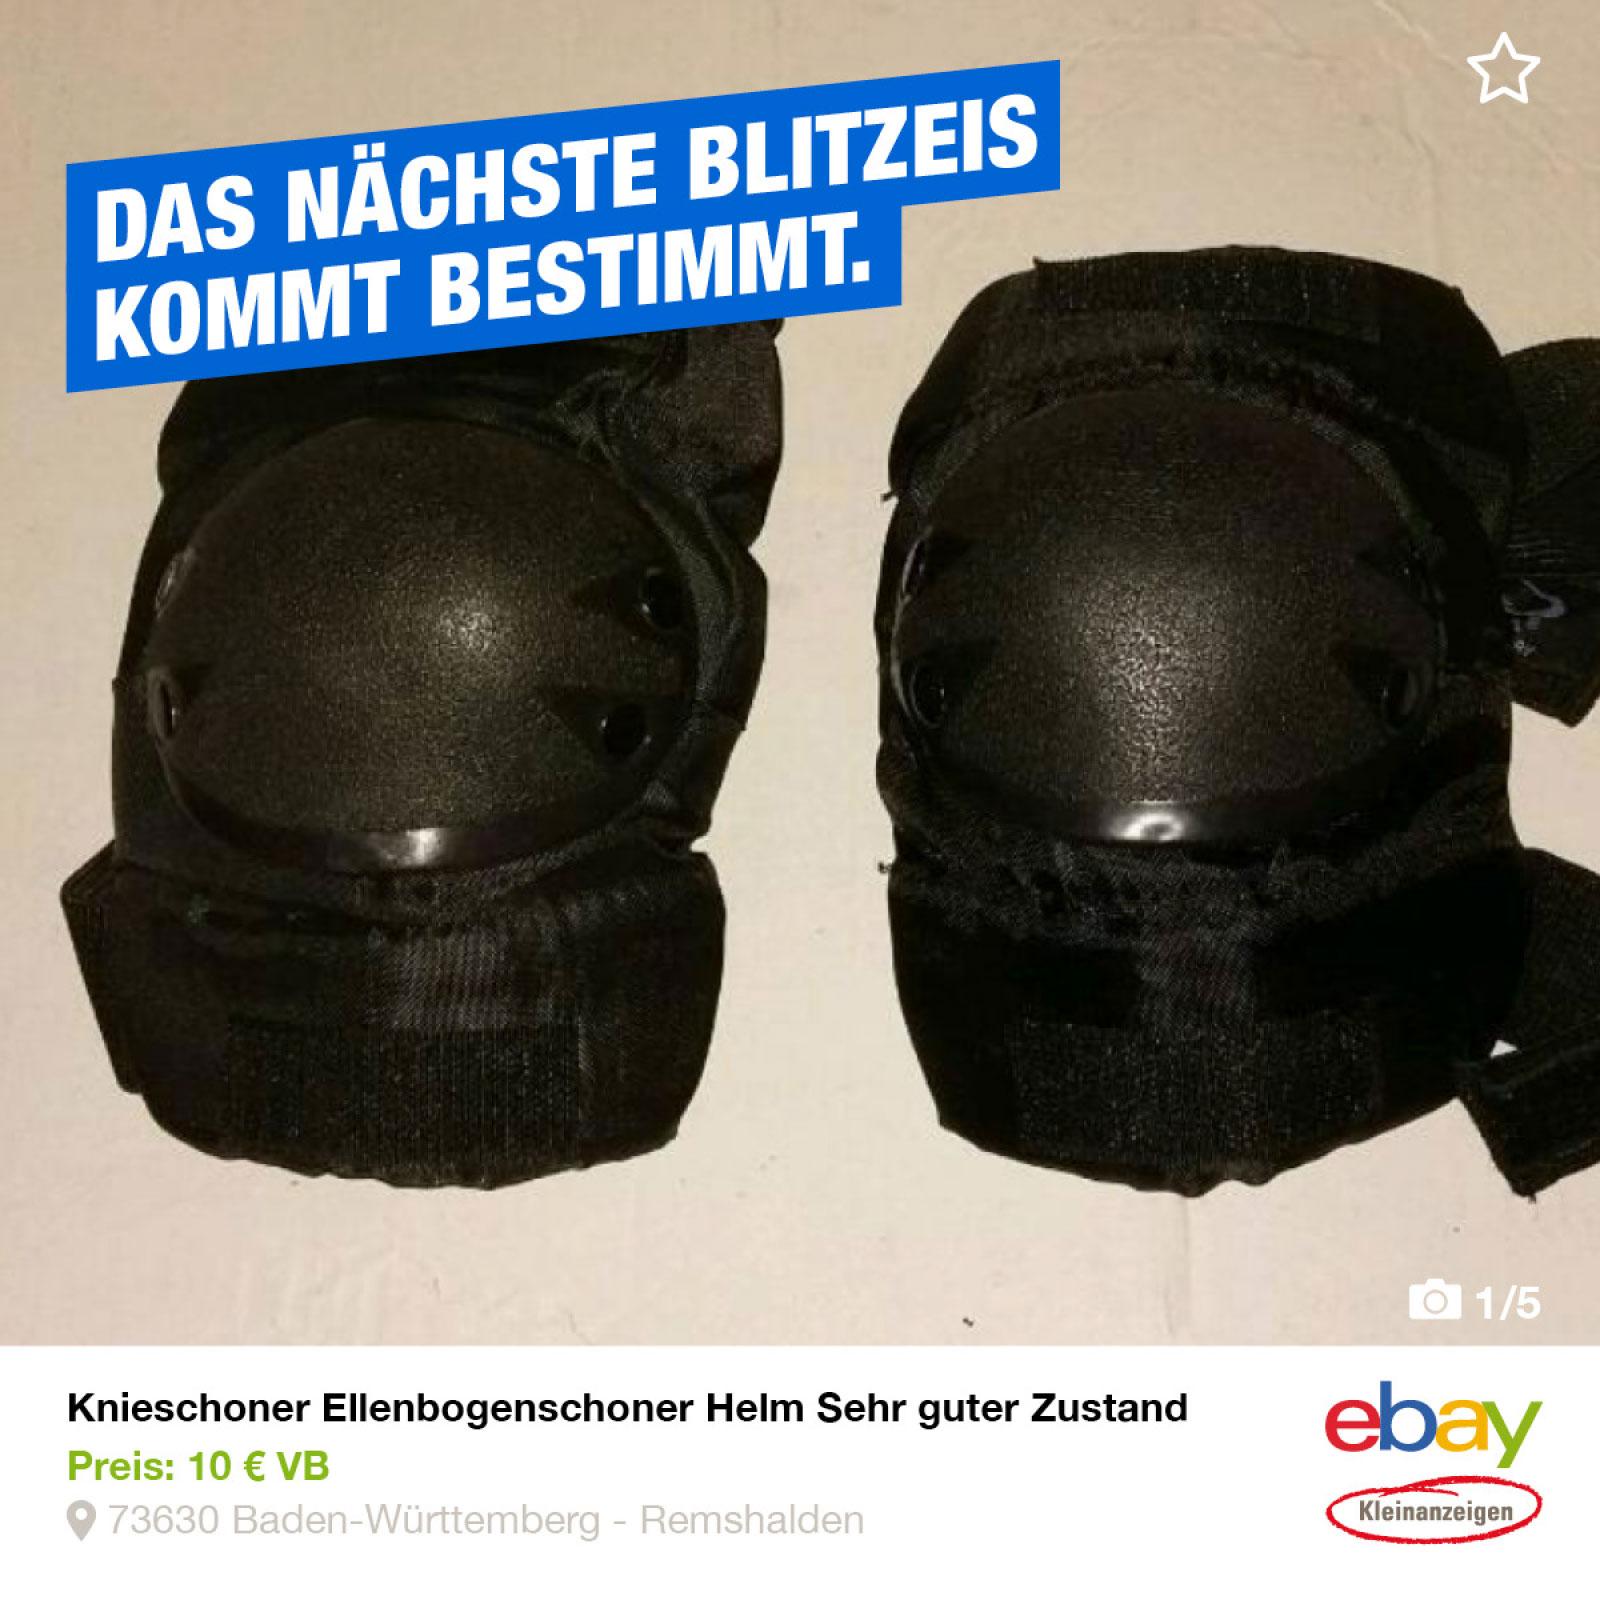 ebay_postings_14x14_rz_72